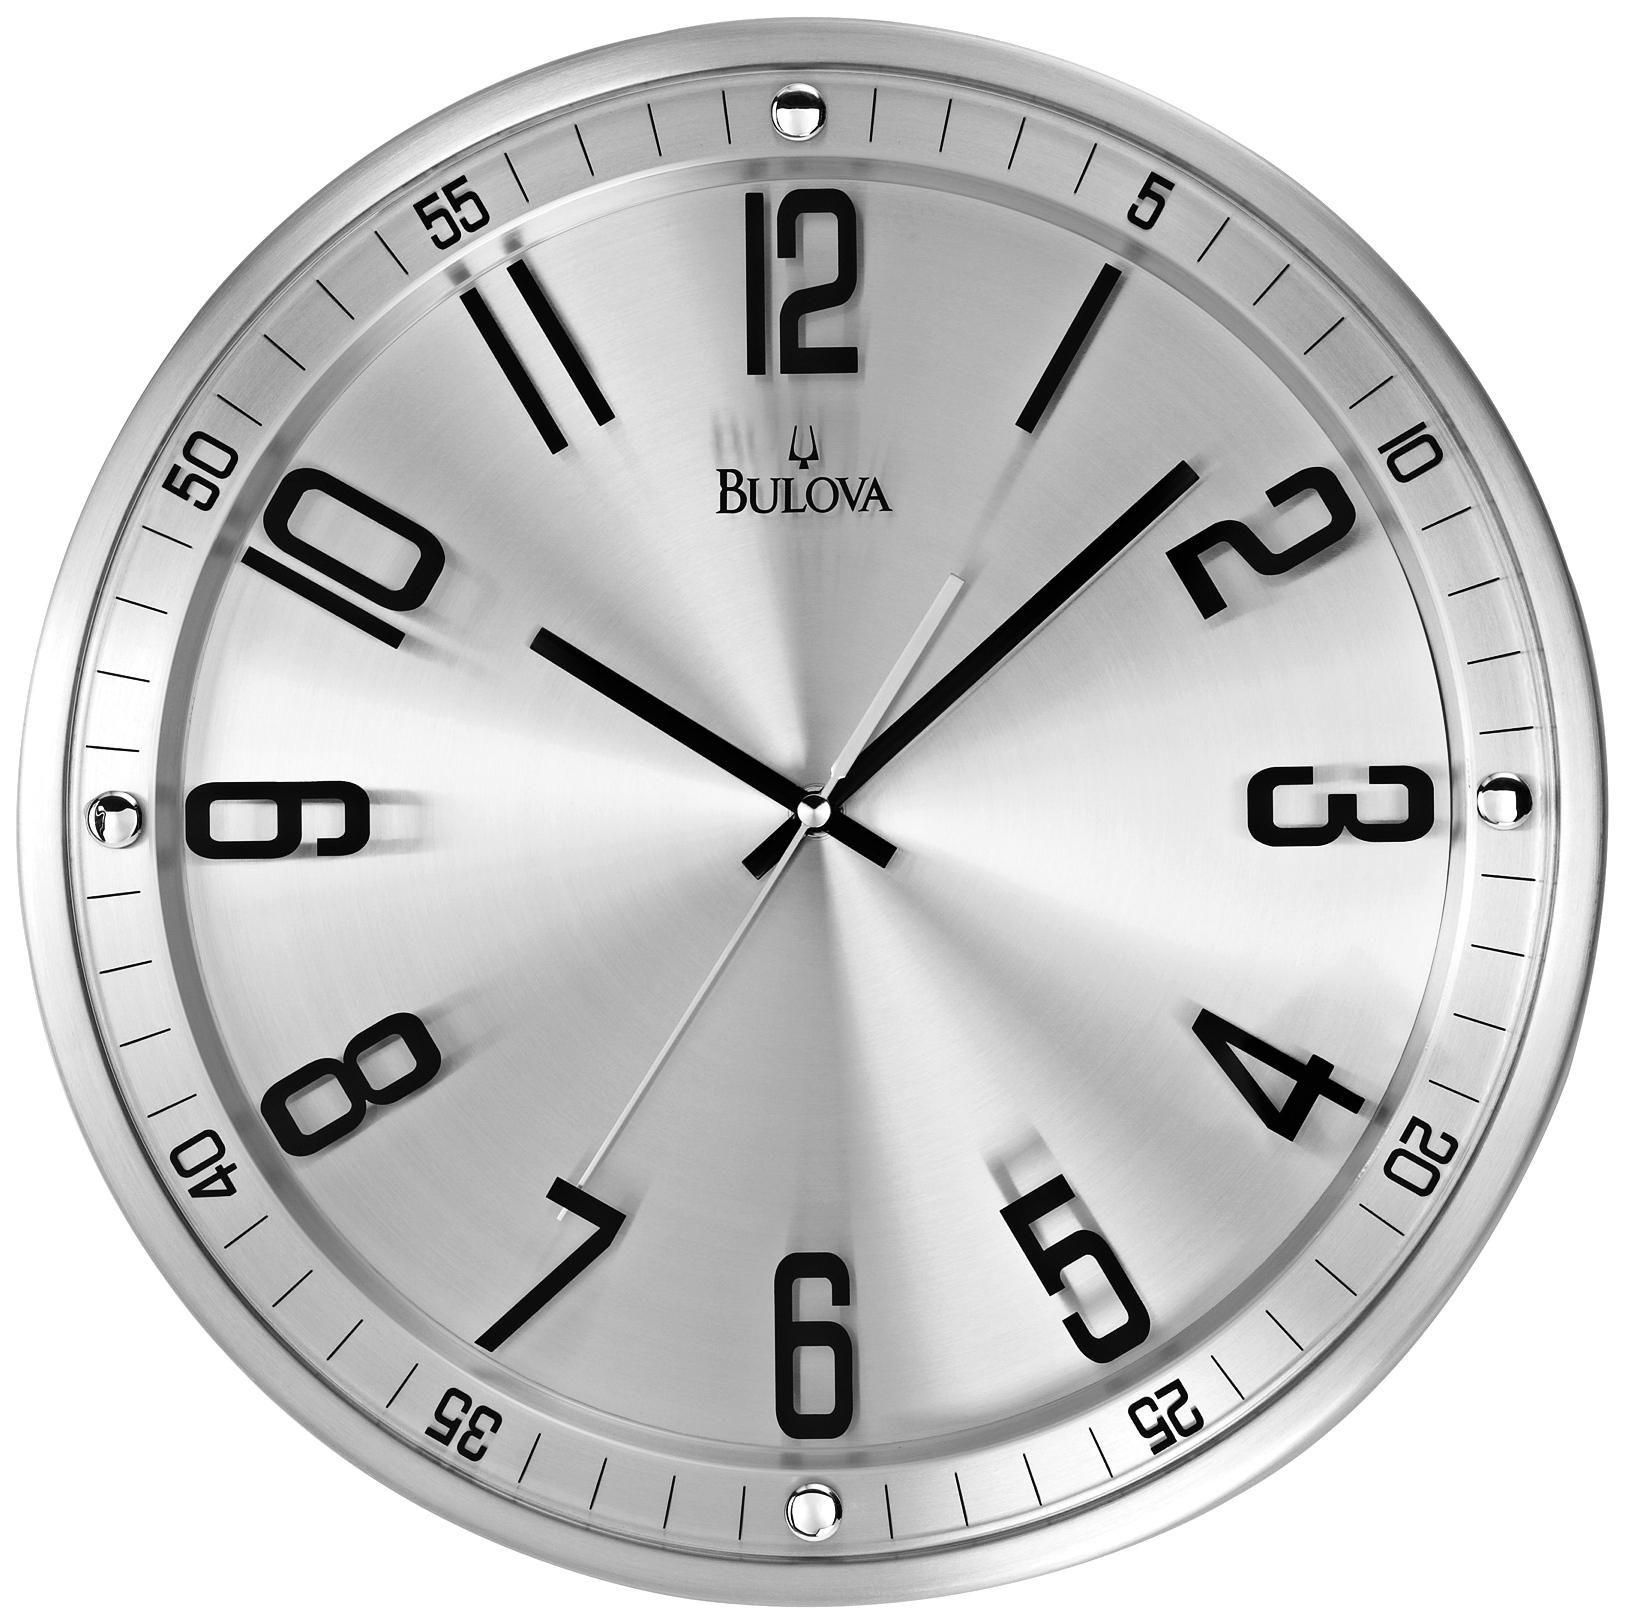 bulova silhouette  high stainless steel wall clock   decor  - bulova silhouette  high stainless steel wall clock